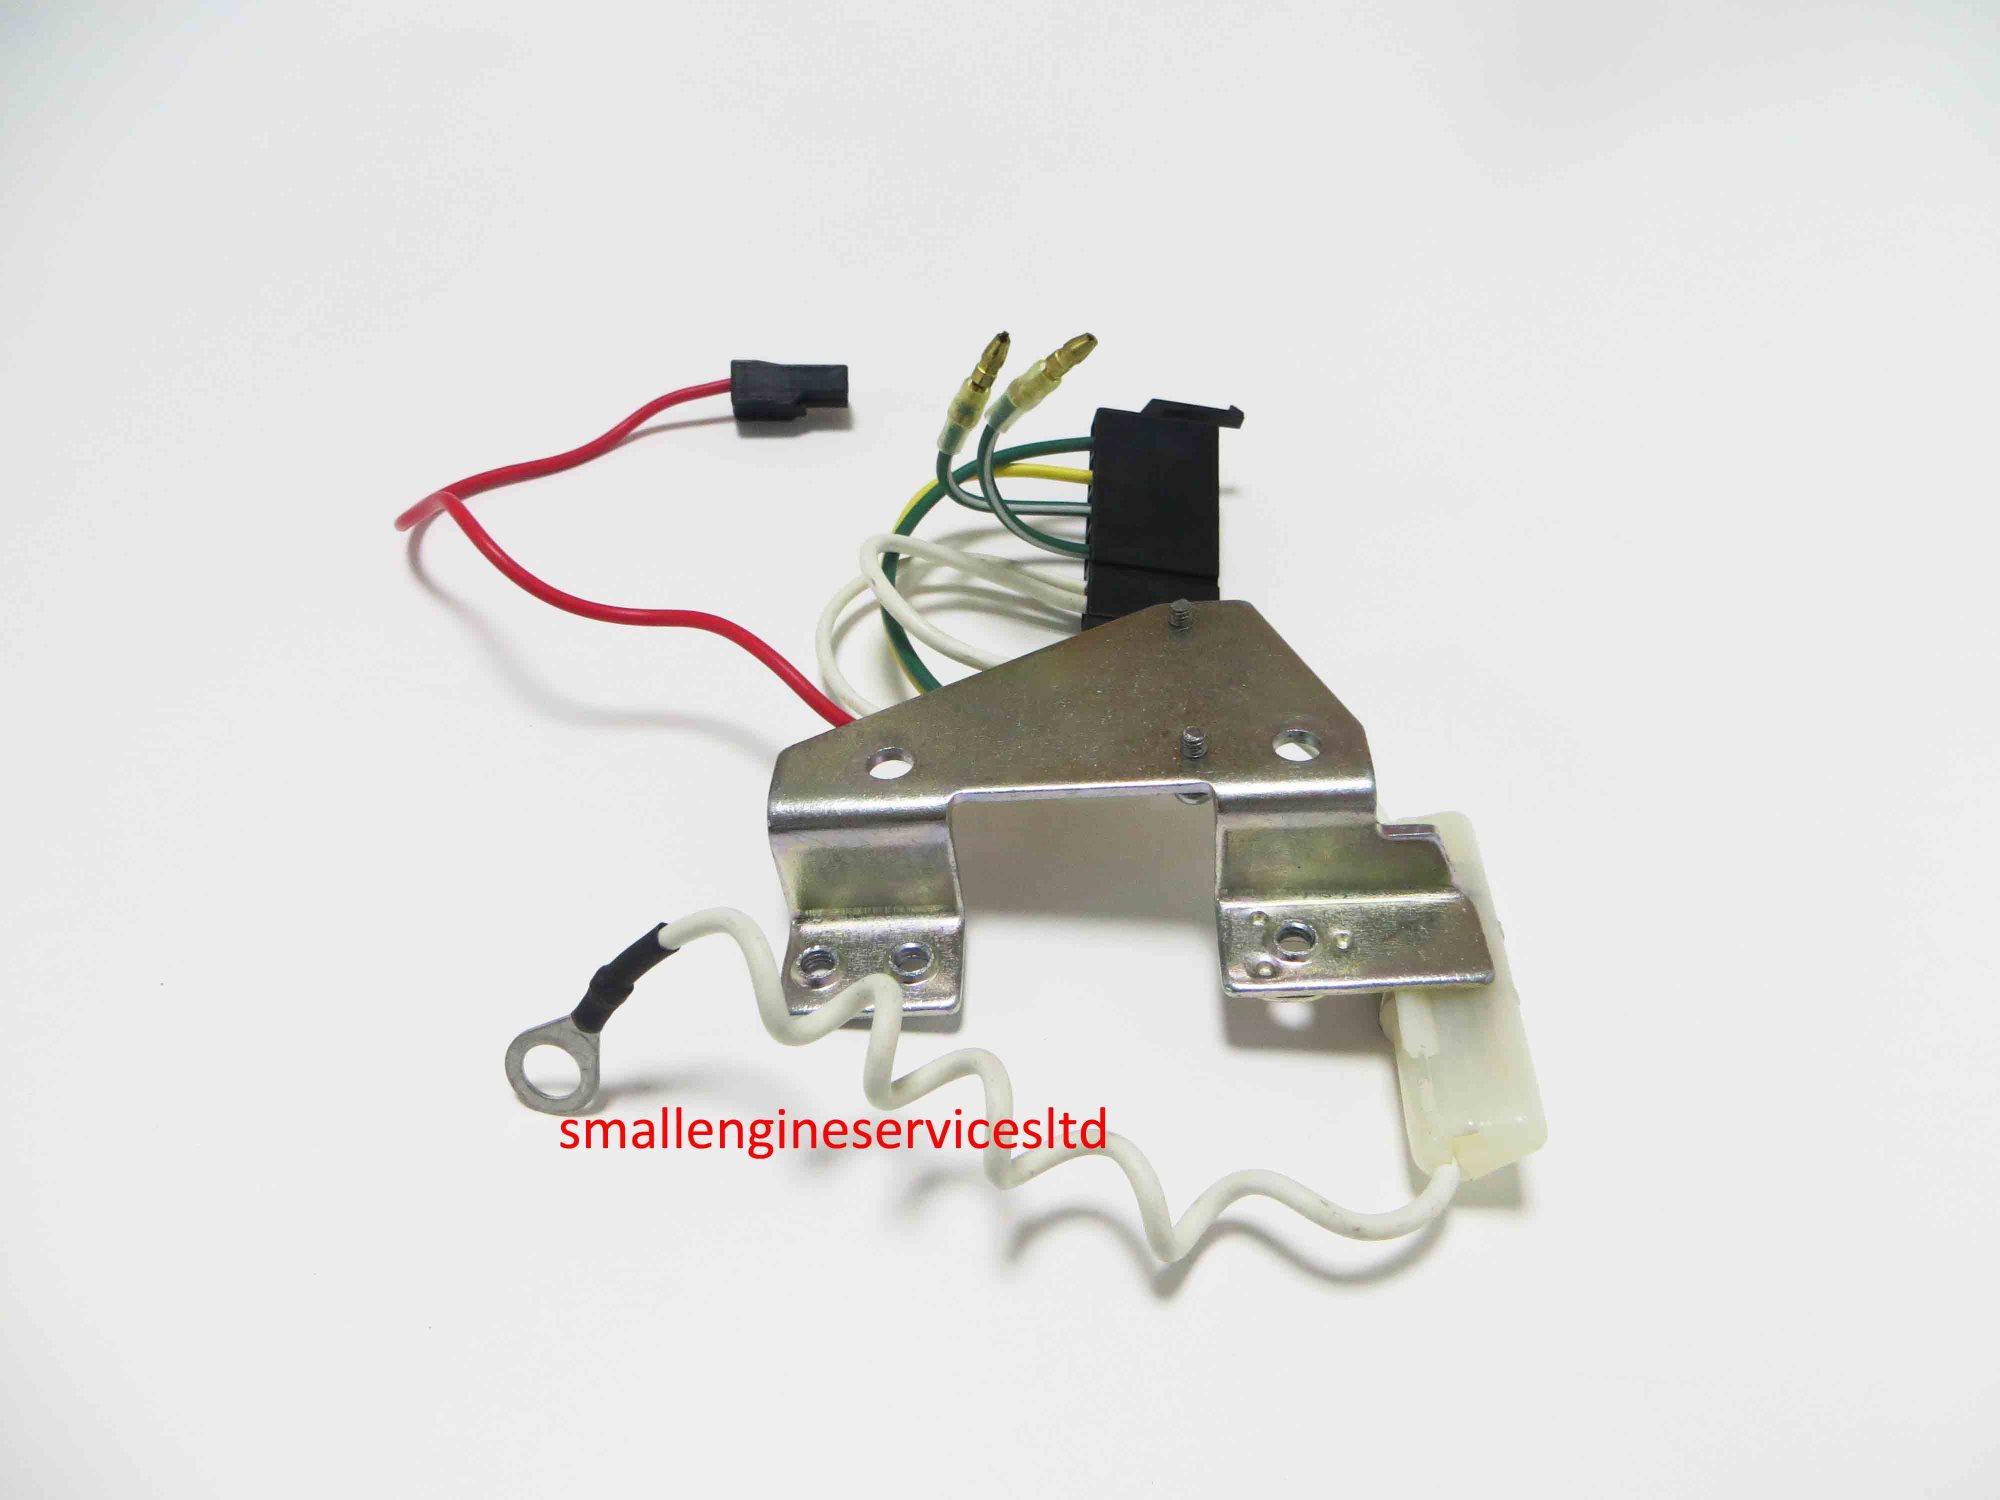 hight resolution of genuine yanmar wiring harness l100 ae n5 n6 l70 ae n5 n6 l48 ae n5 yanmar 3gm30 wiring harness yanmar wiring harness